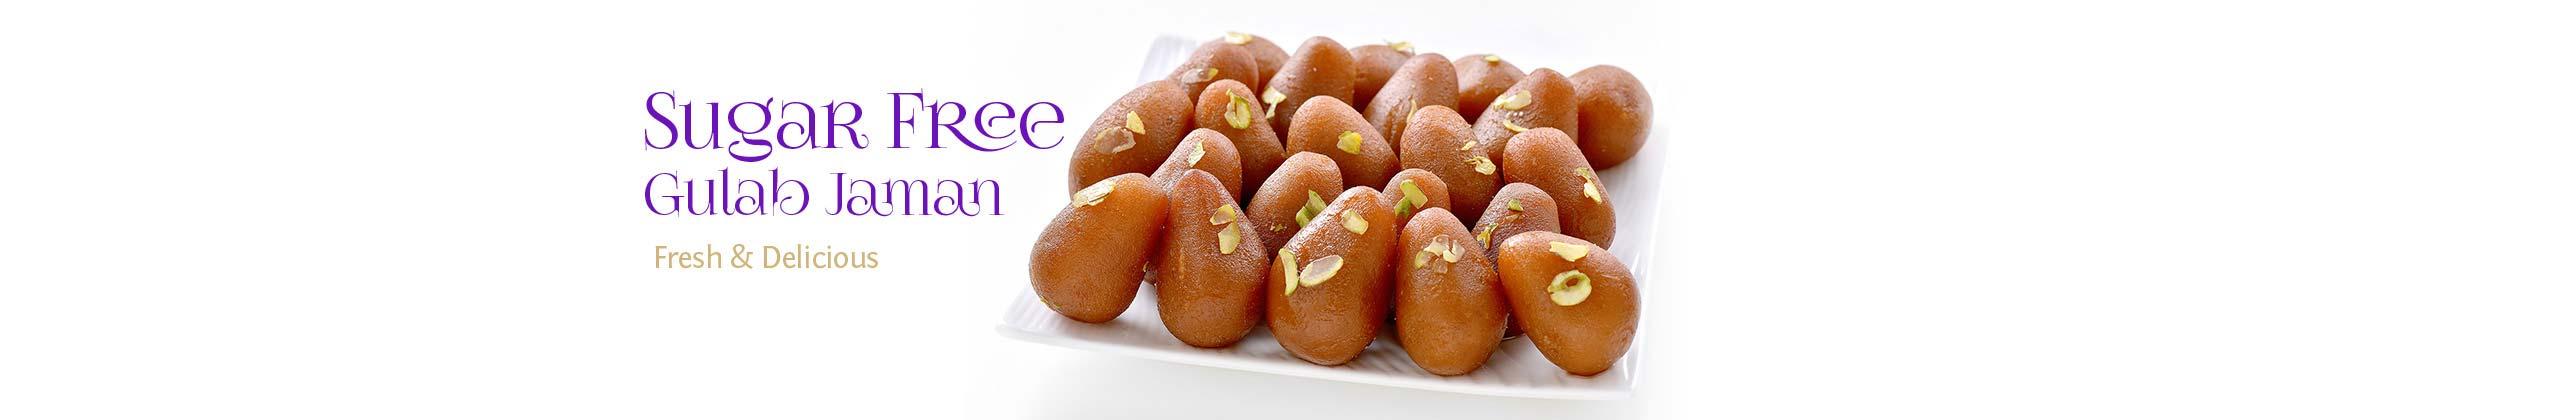 8-Sugar-Free-Gulab-Jaman